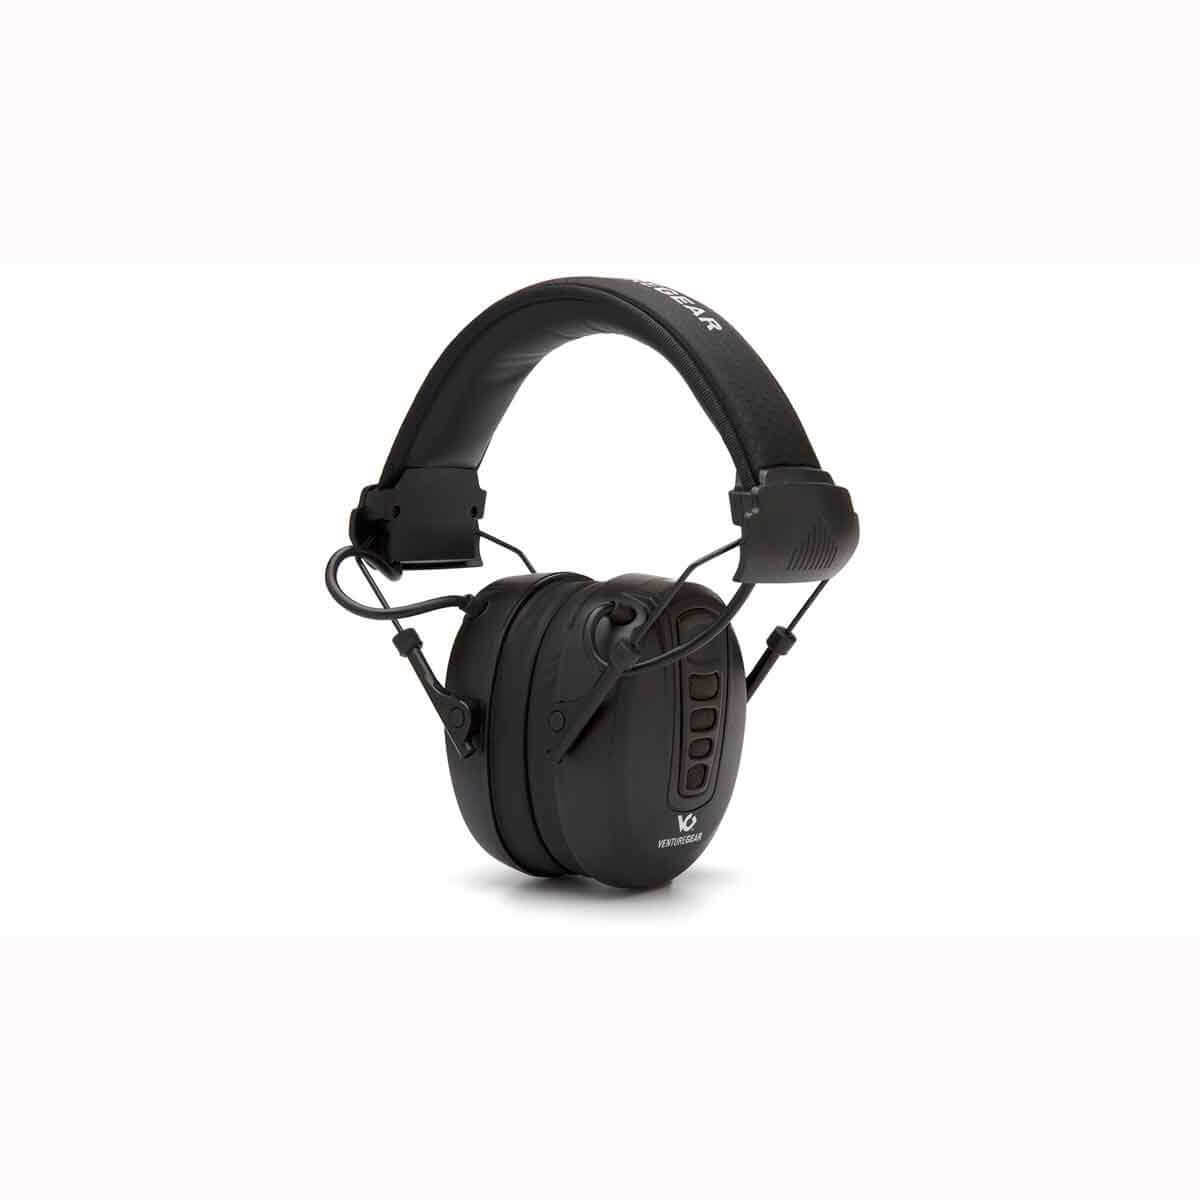 Pyramex Noise Reducing Electronic Earmuffs